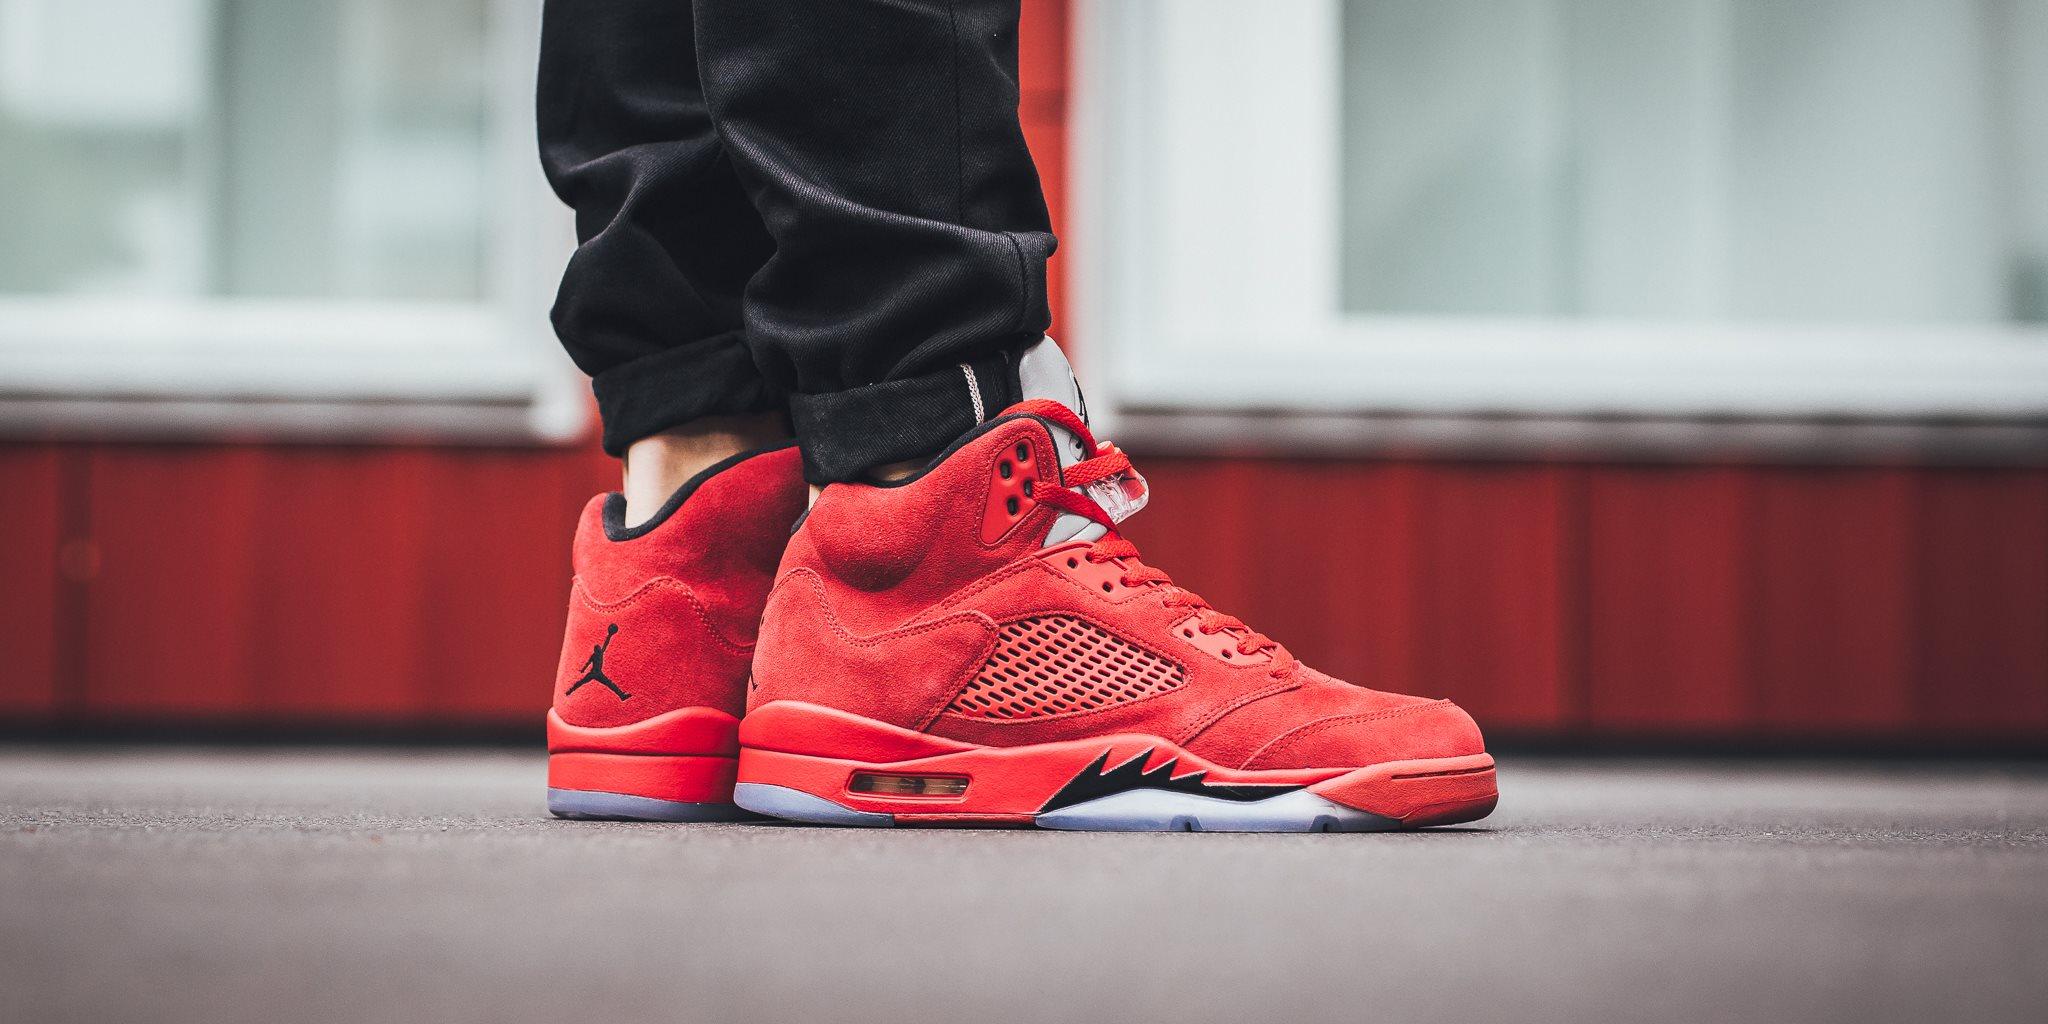 Air Jordan 5 Red Suede